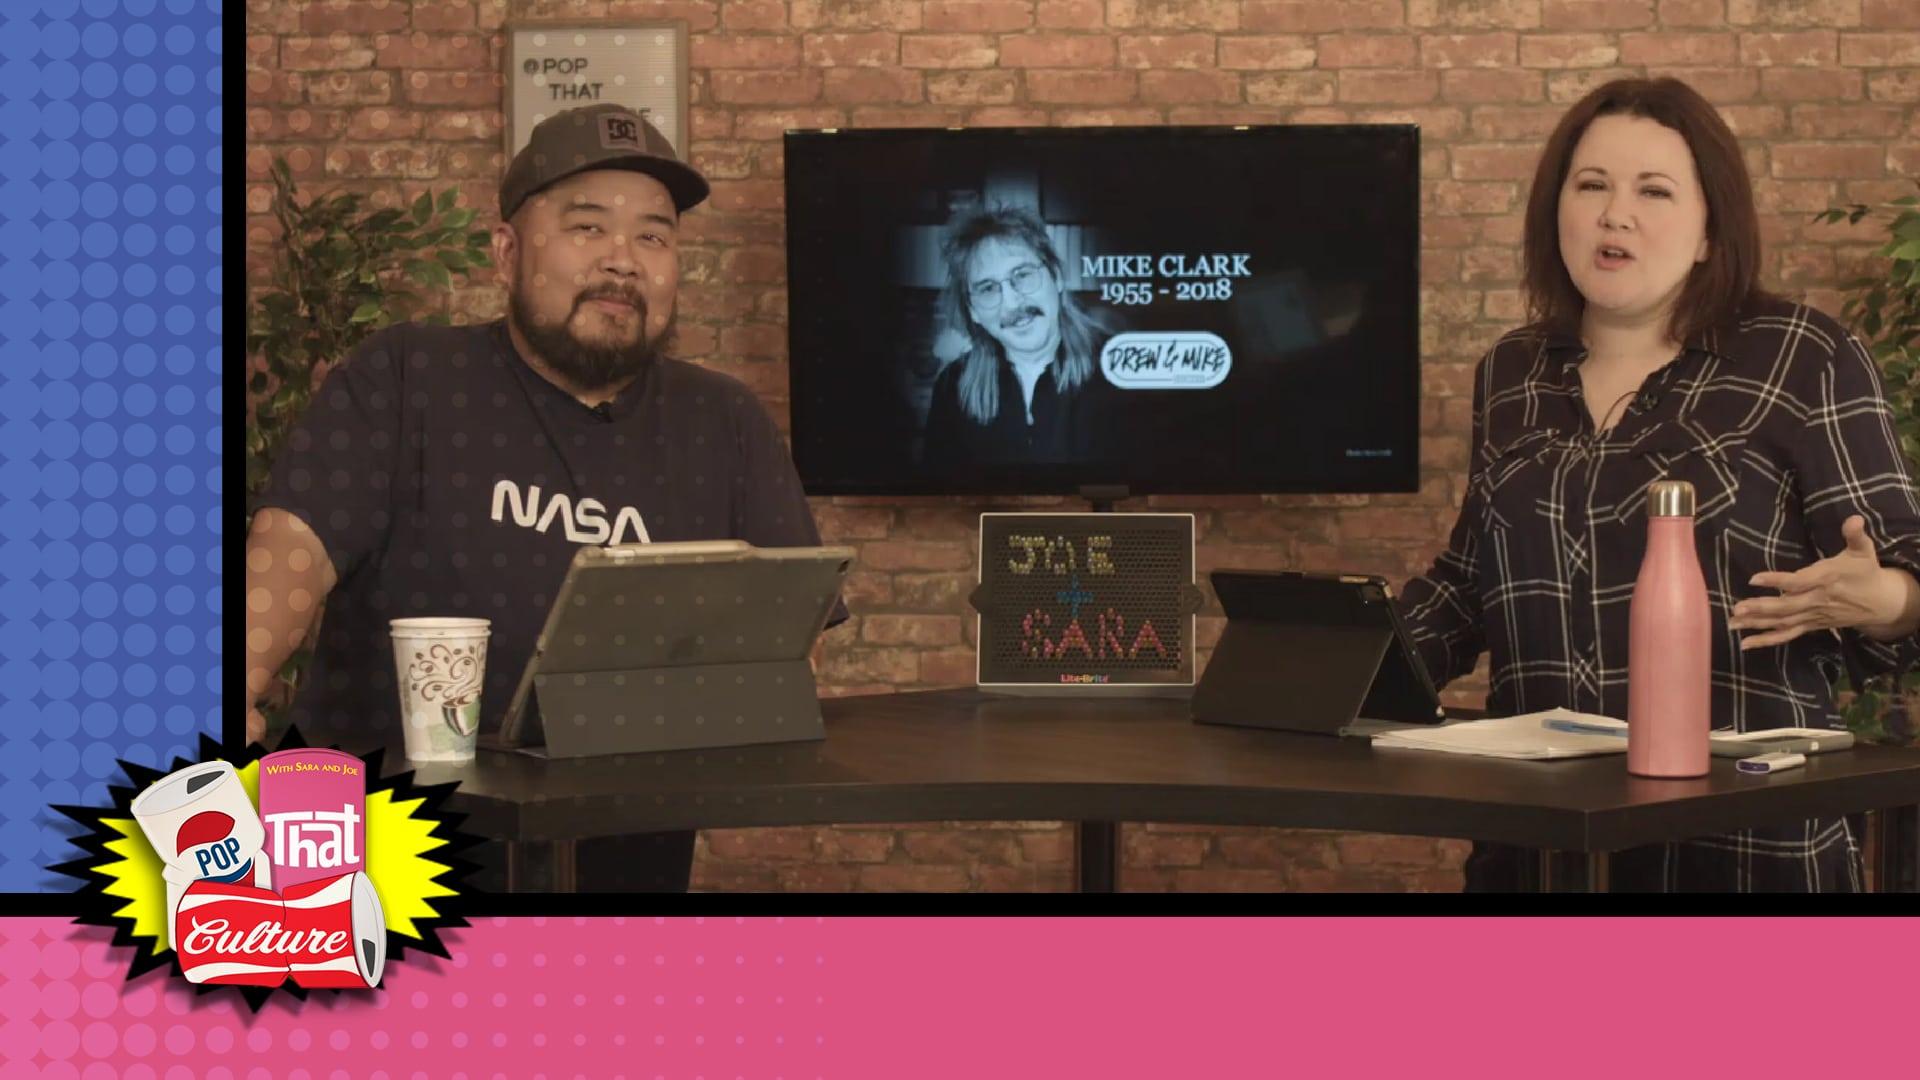 Pop That Culture - Episode 121